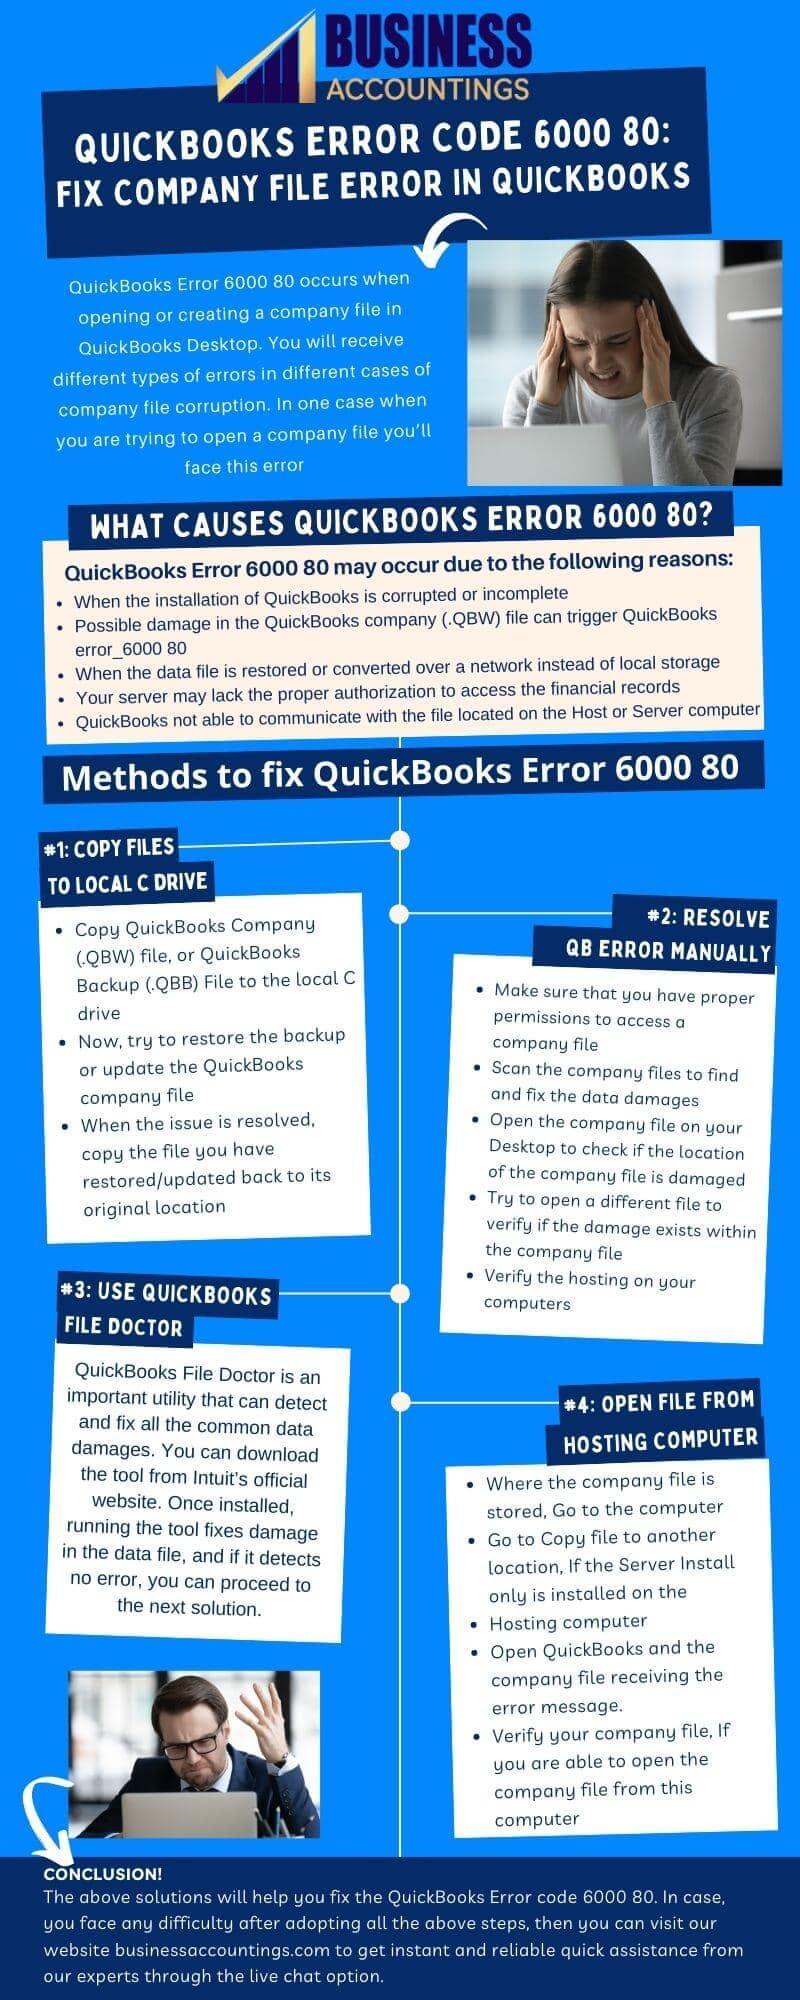 Infographic to Fix QuickBooks Error 6000, 80